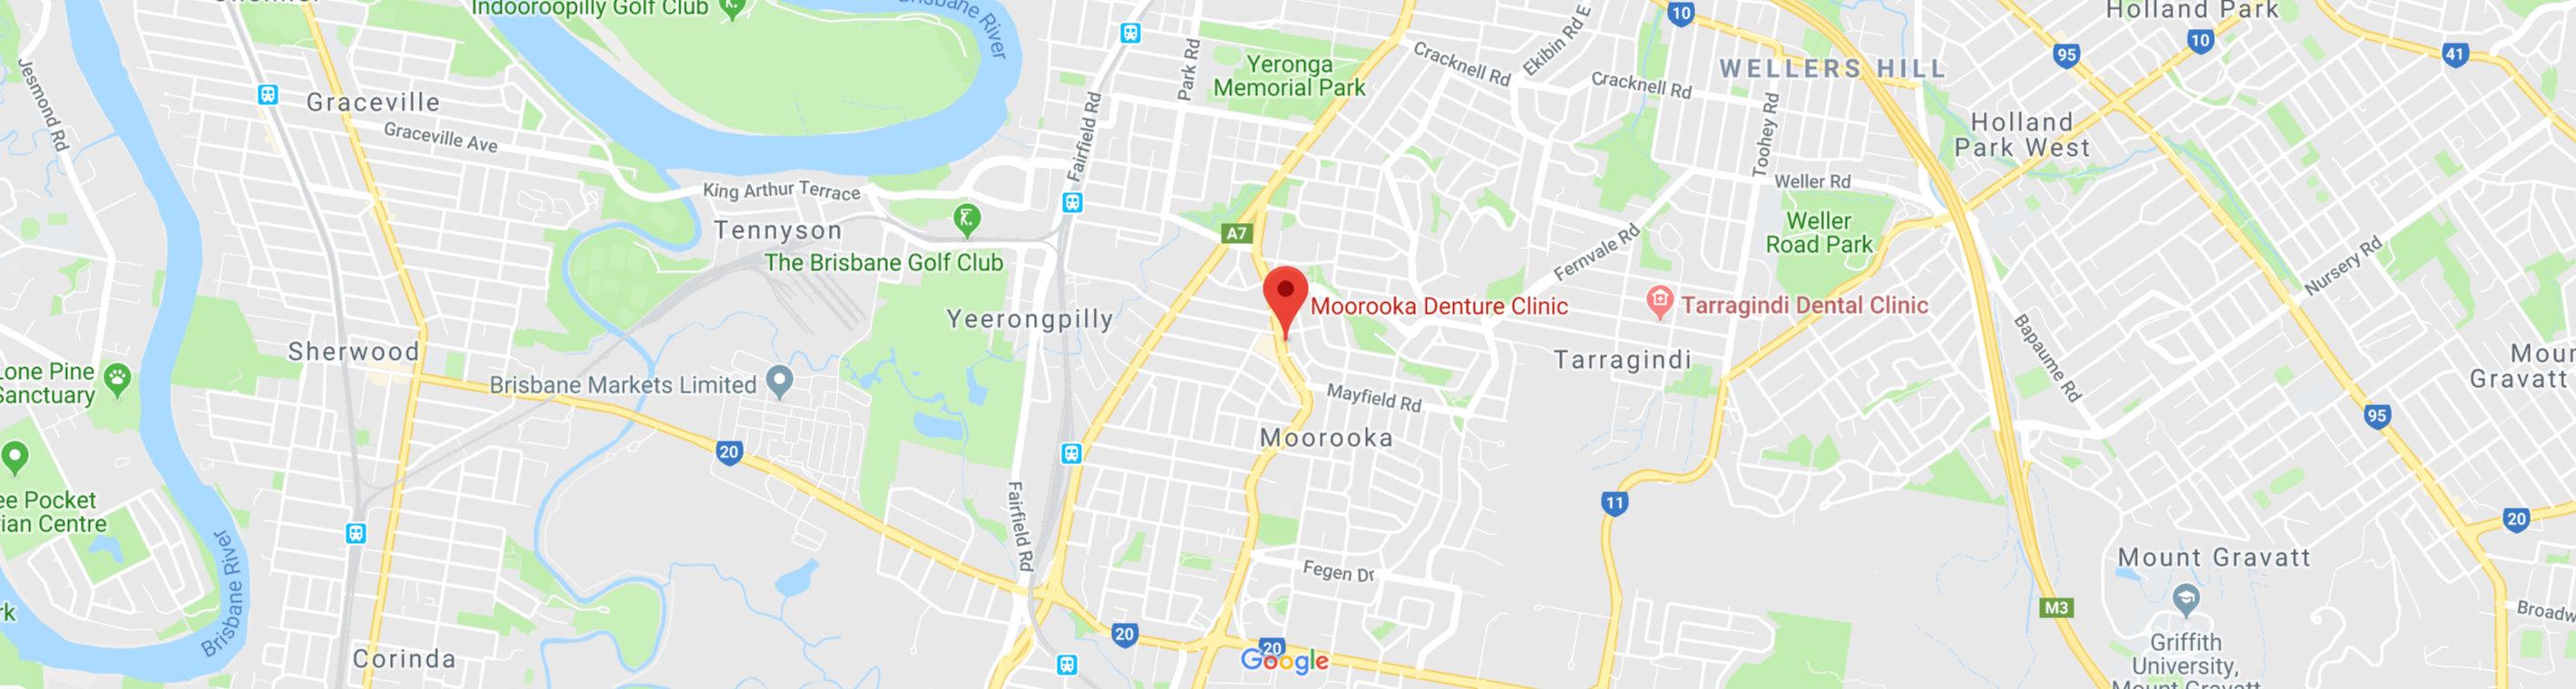 View Moorooka Denture Clinic location